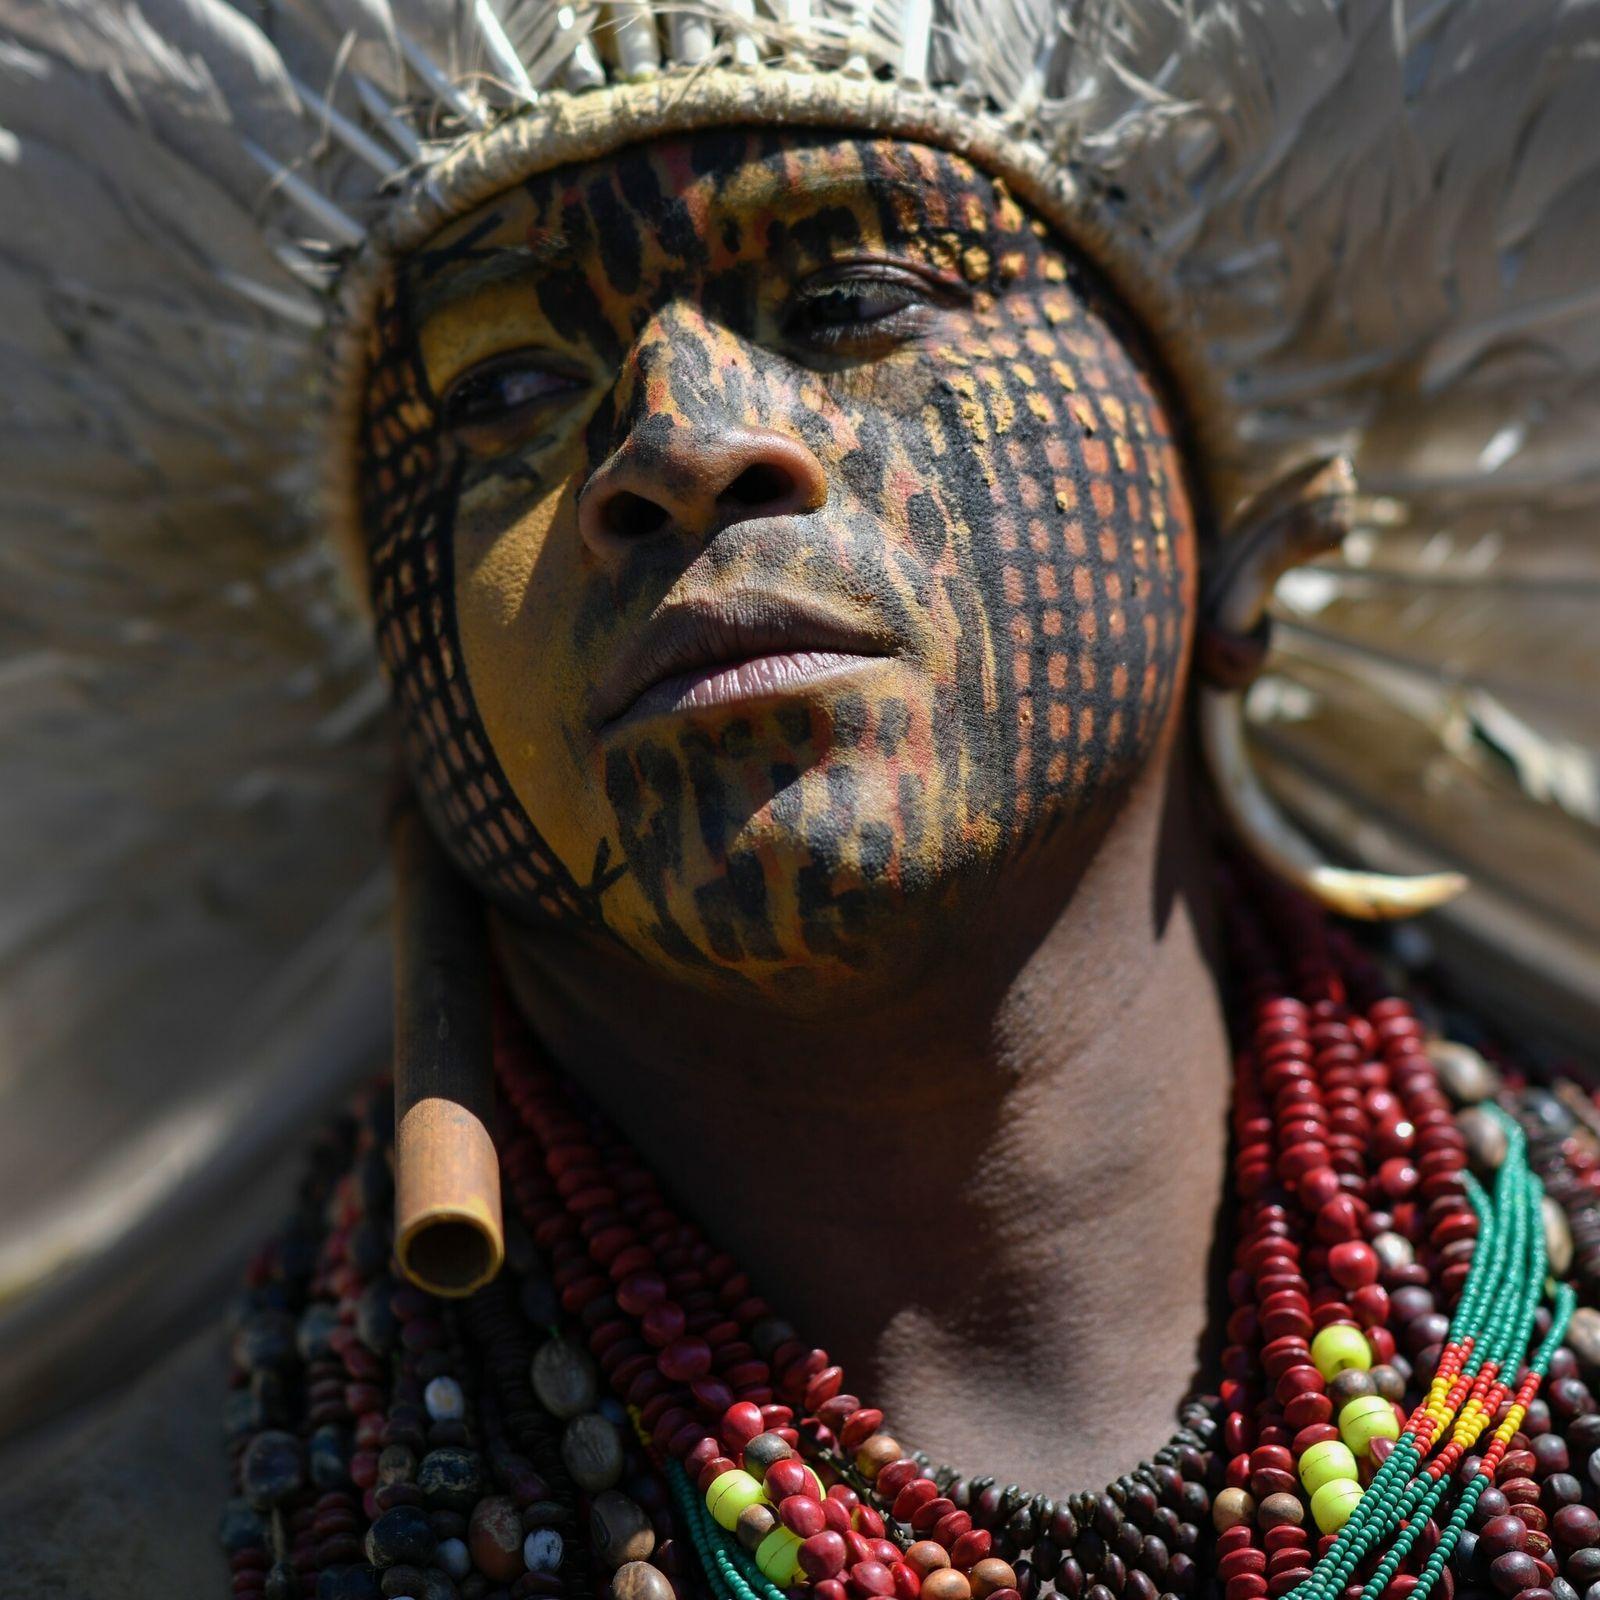 BRASILIA, INDIGENOUS PROTEST